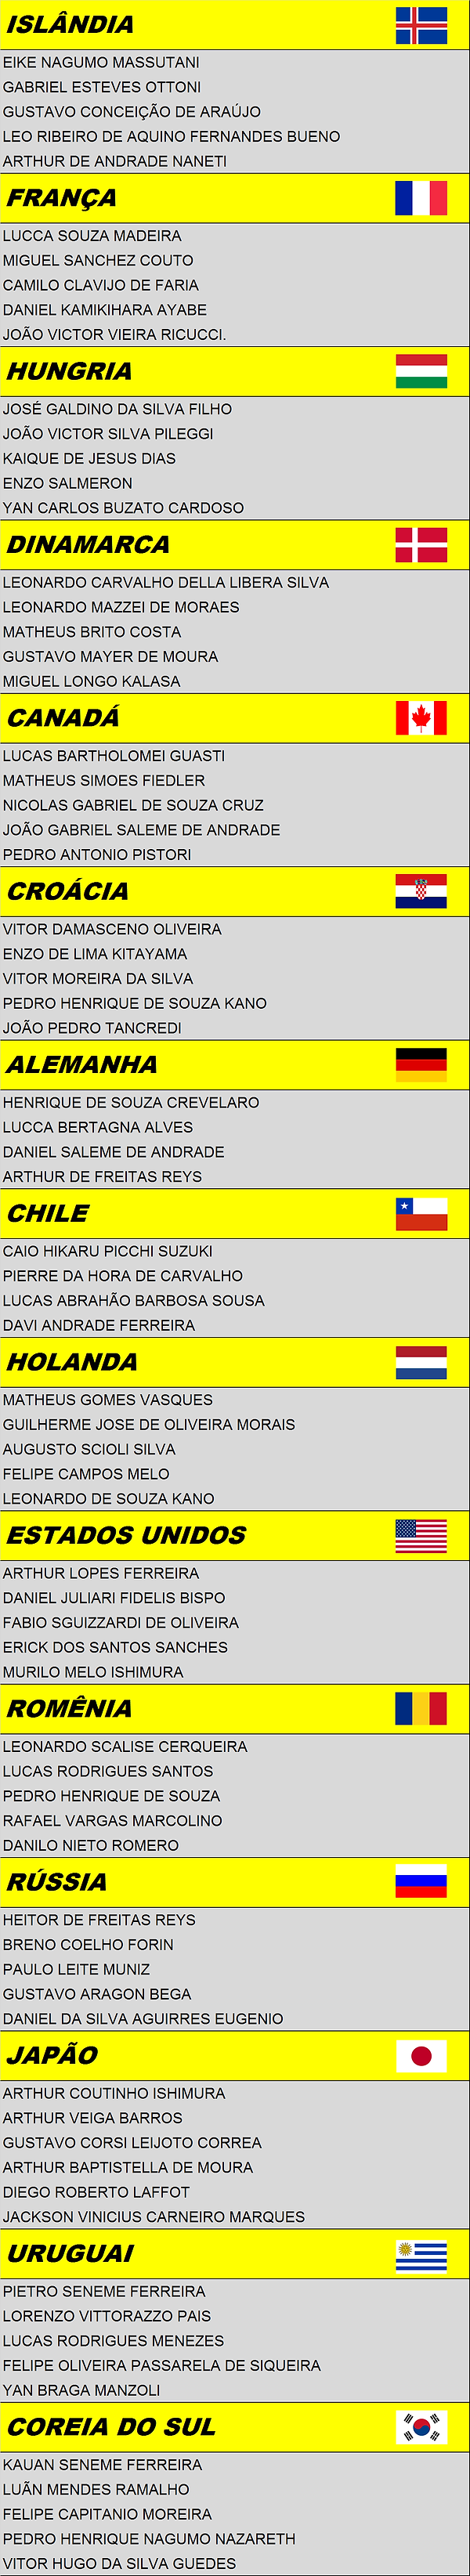 Hebraica Lista das equipes masculino.png